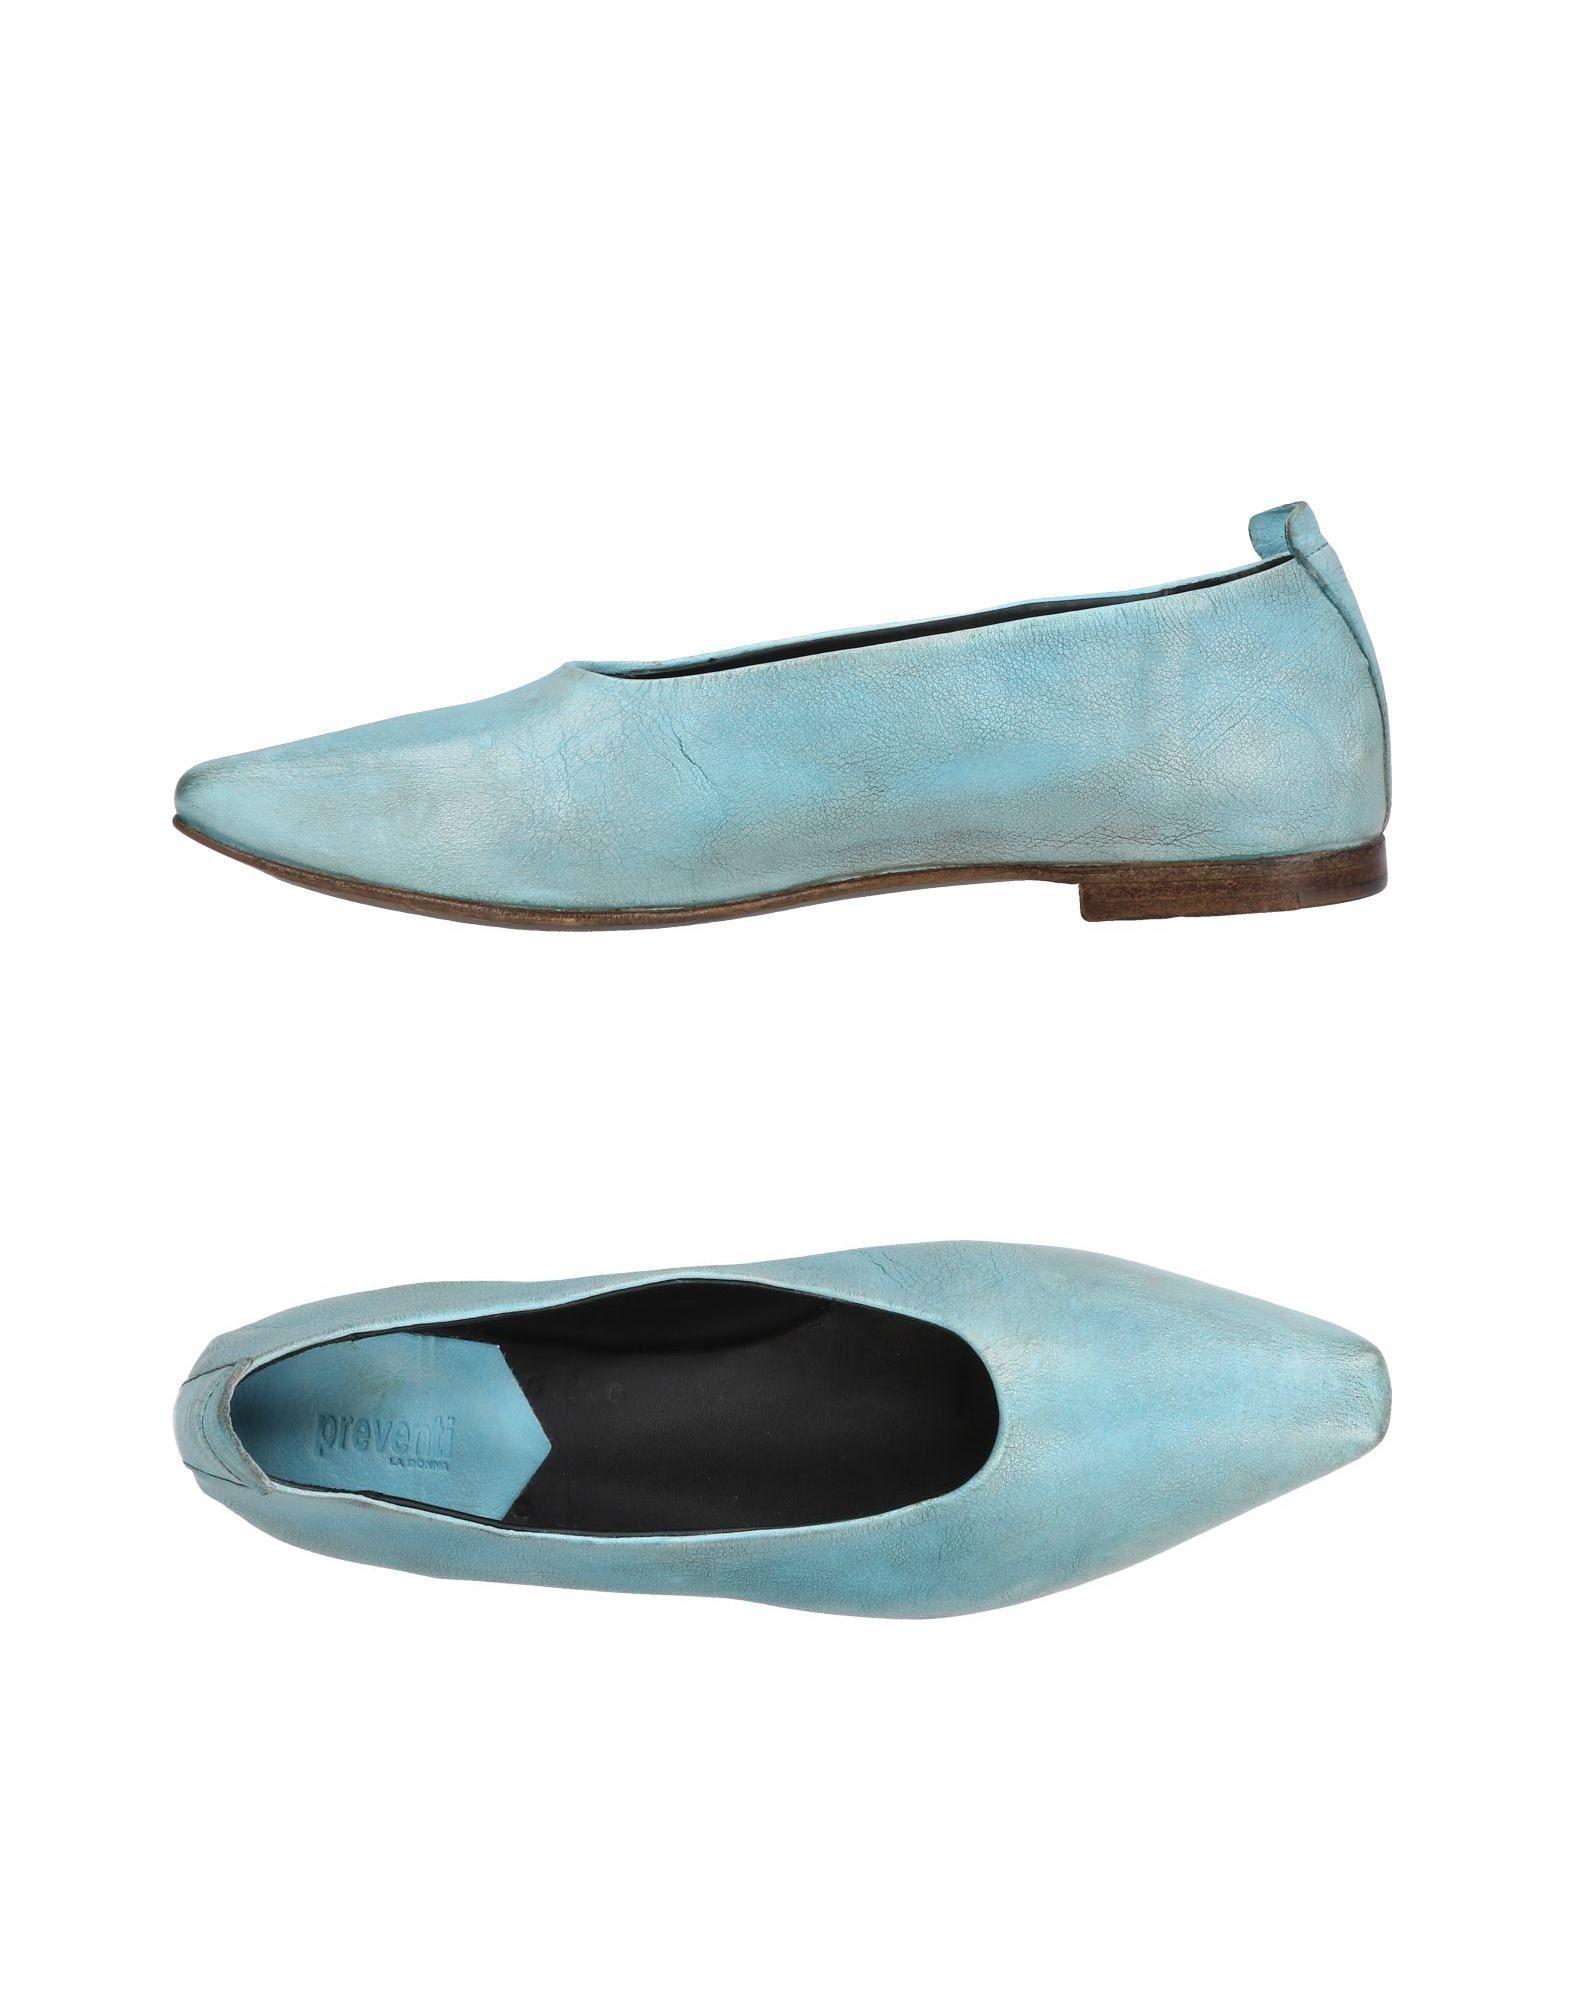 2cf5b491557 Preventi - Blue Ballet Flats - Lyst. View fullscreen